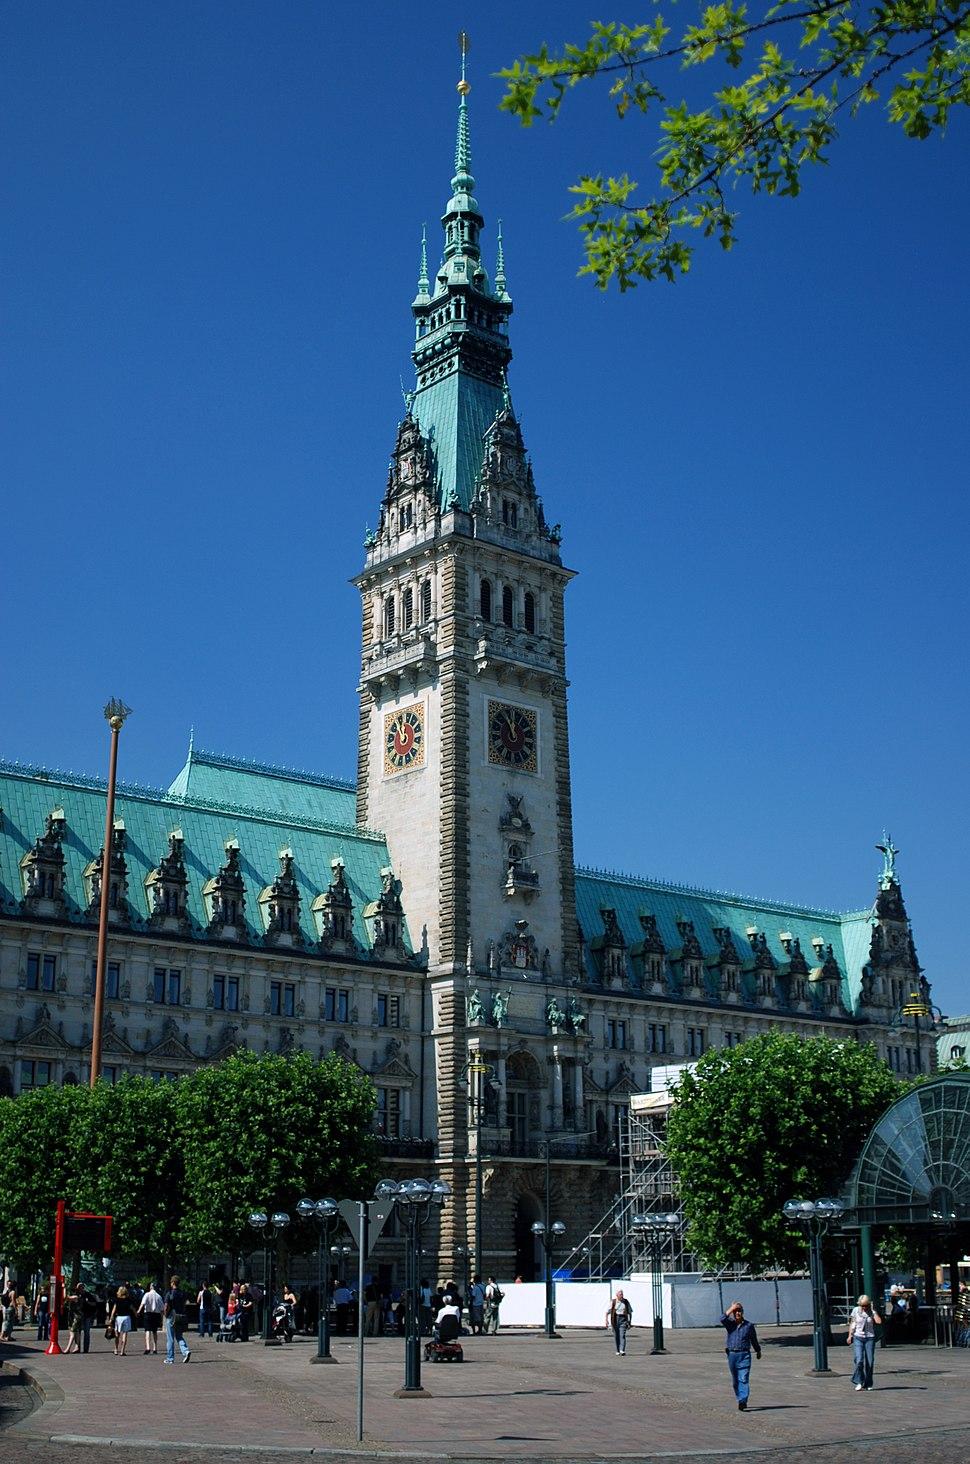 Hamburg town hall tower